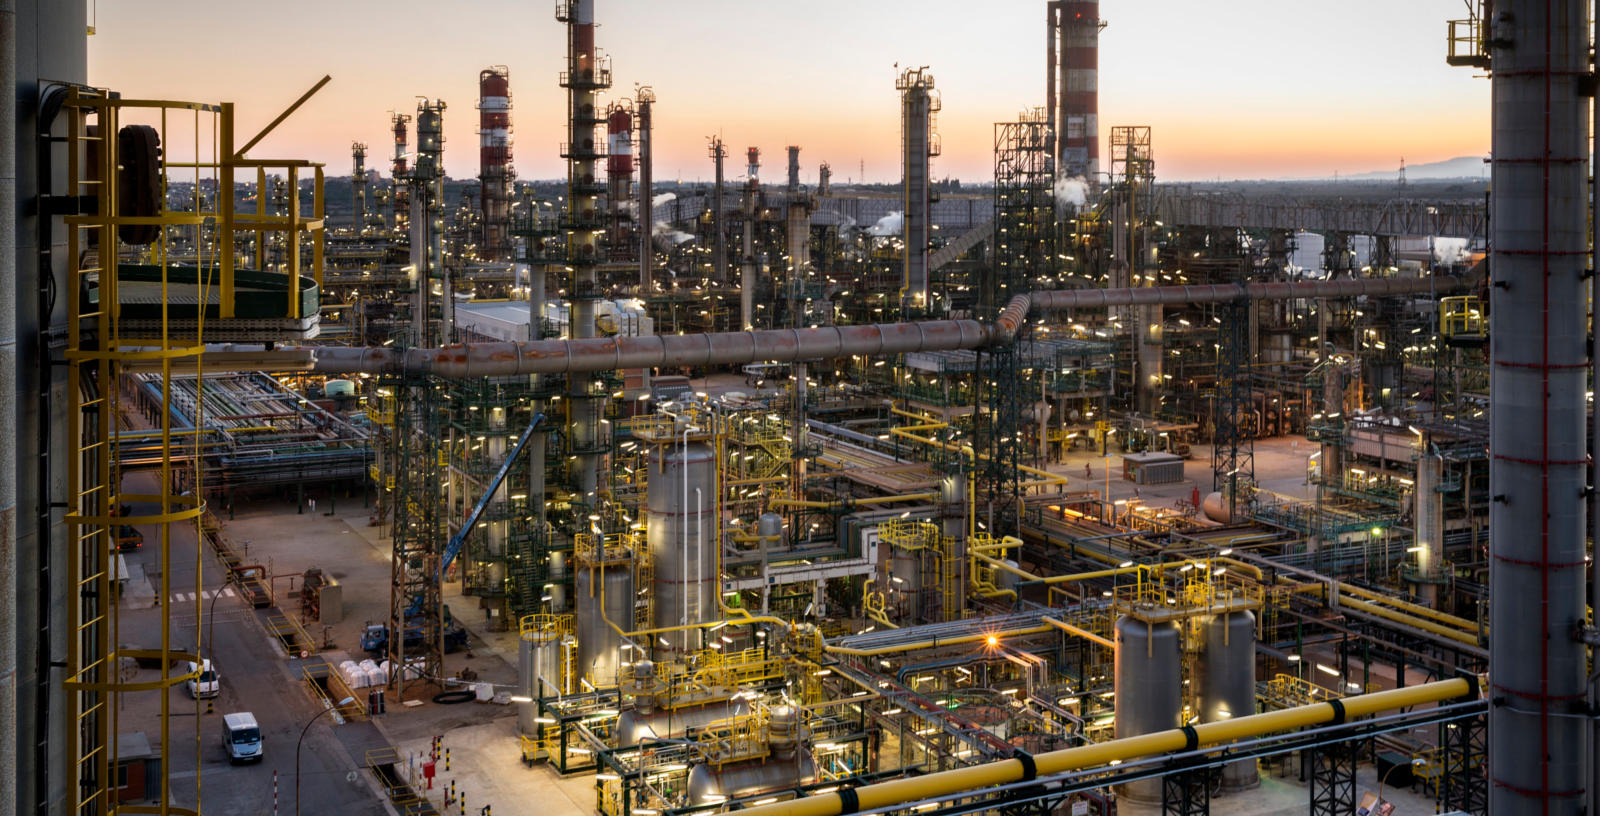 Refinery_Puertollano_IDOM